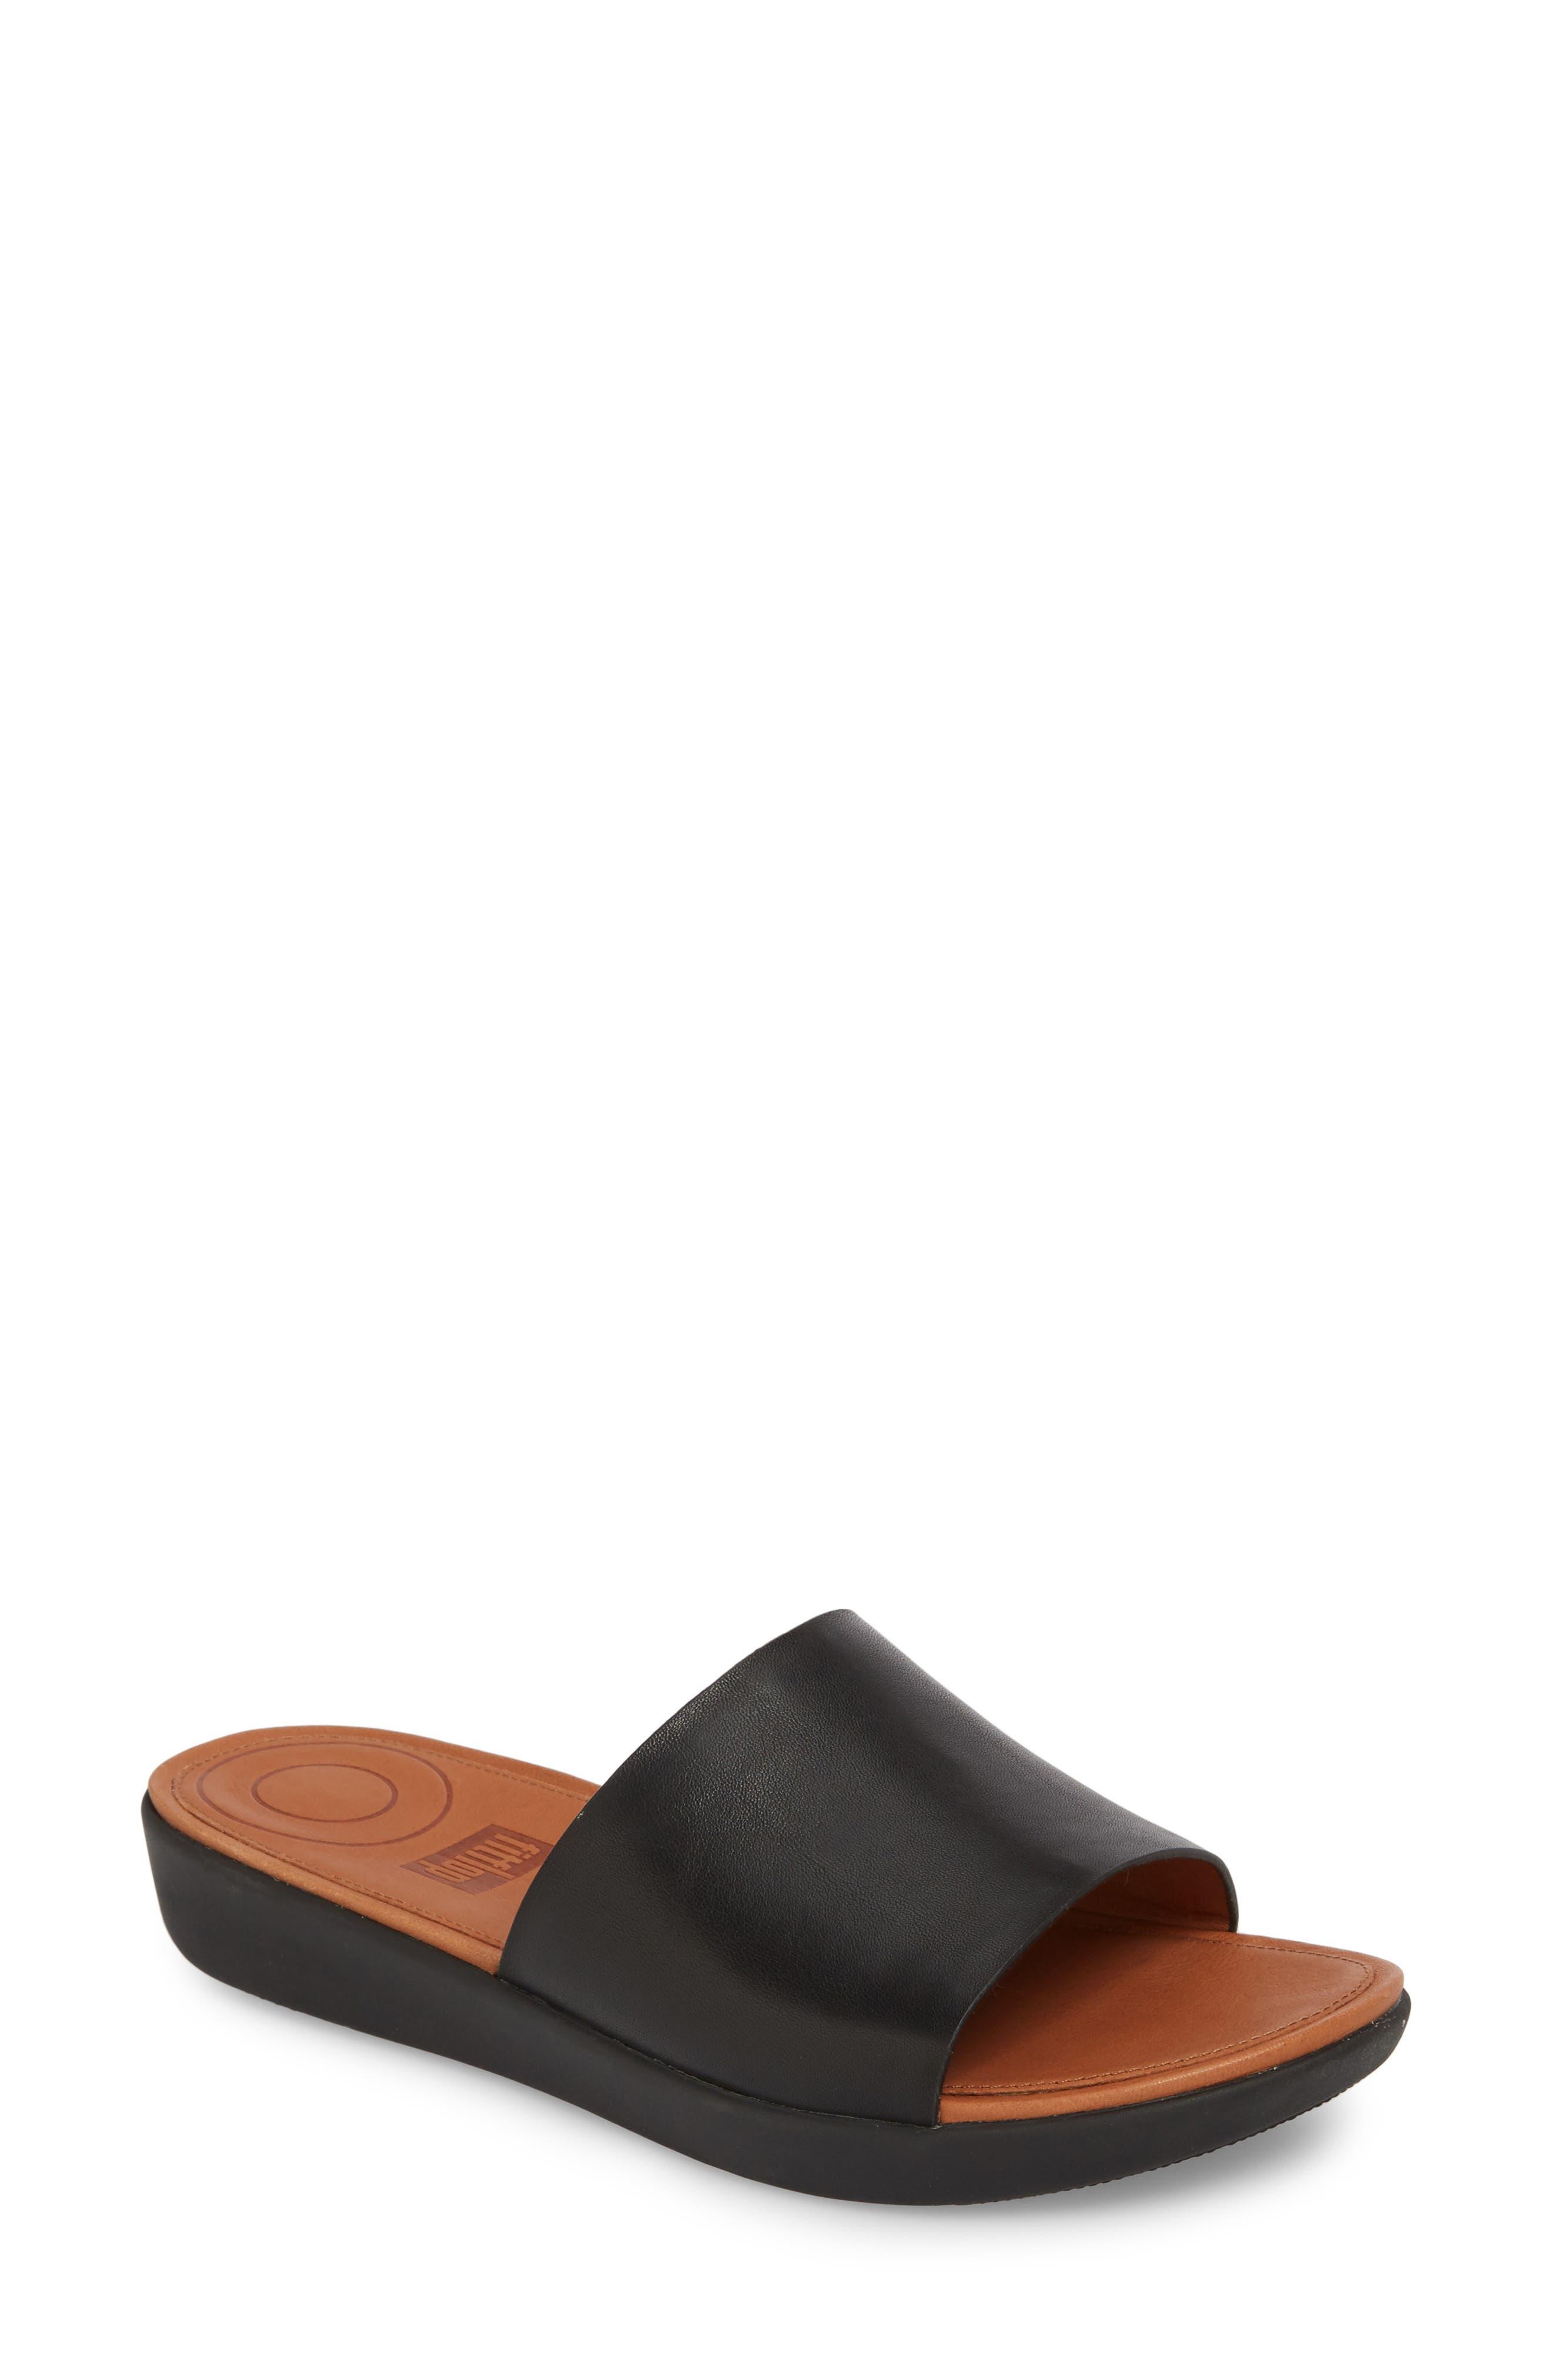 Fitflop Sola Sandal